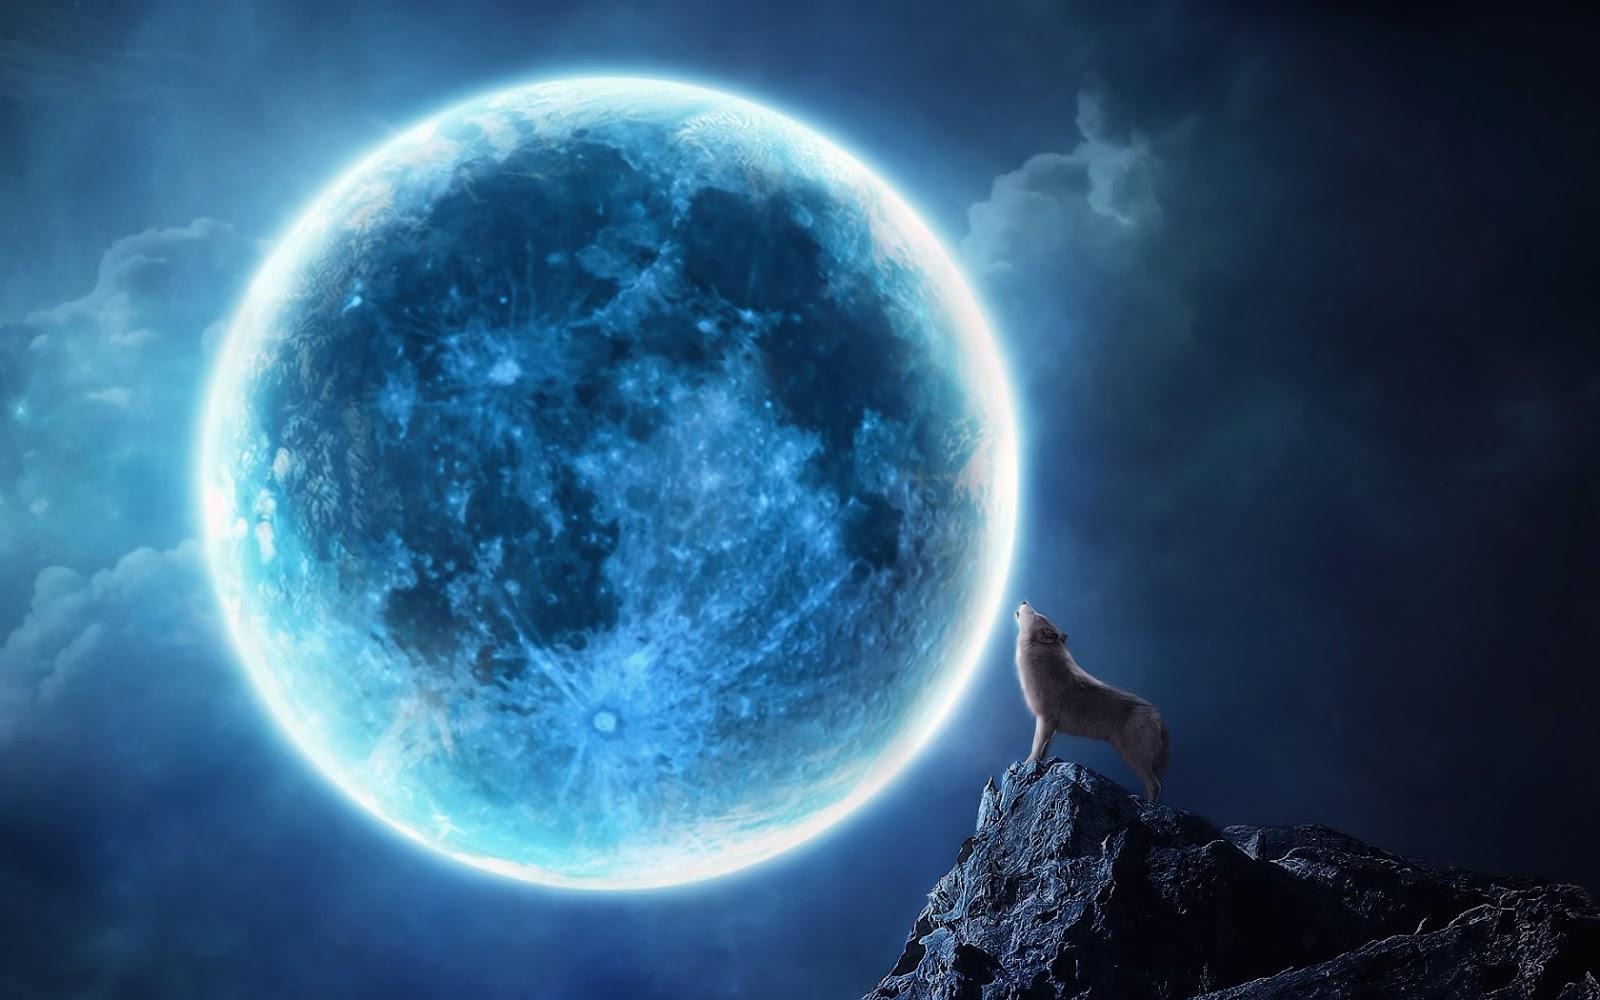 http://3.bp.blogspot.com/-IzOOjXXHjG8/USu11AS_nDI/AAAAAAAAN1E/BYkHaRFIlg0/s1600/wallpaper-van-een-huilende-wolf-bij-volle-maan.jpg